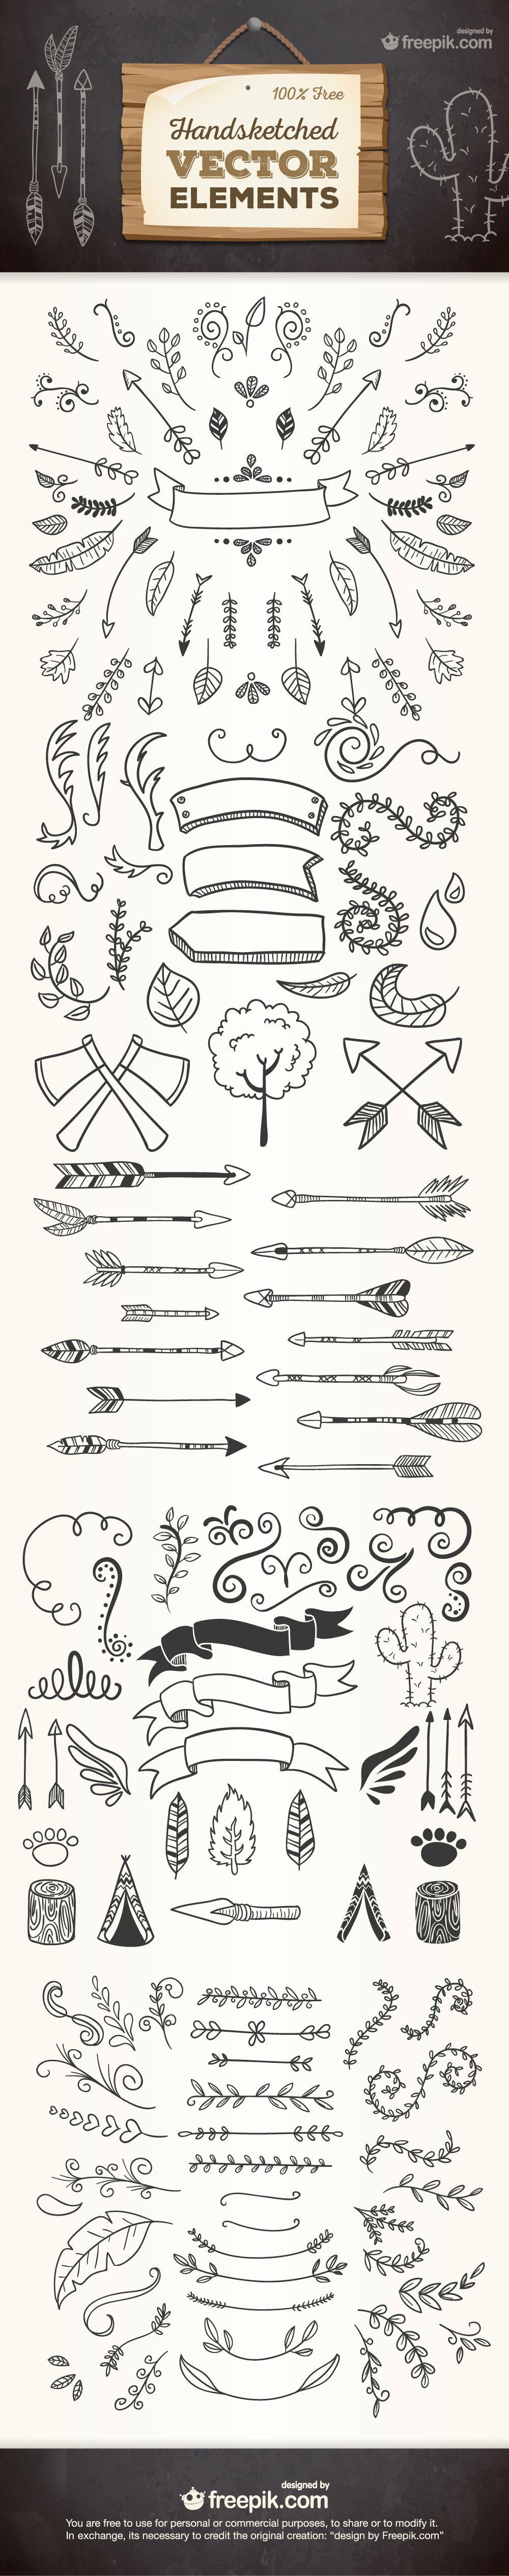 Flechas patrones                                                       …